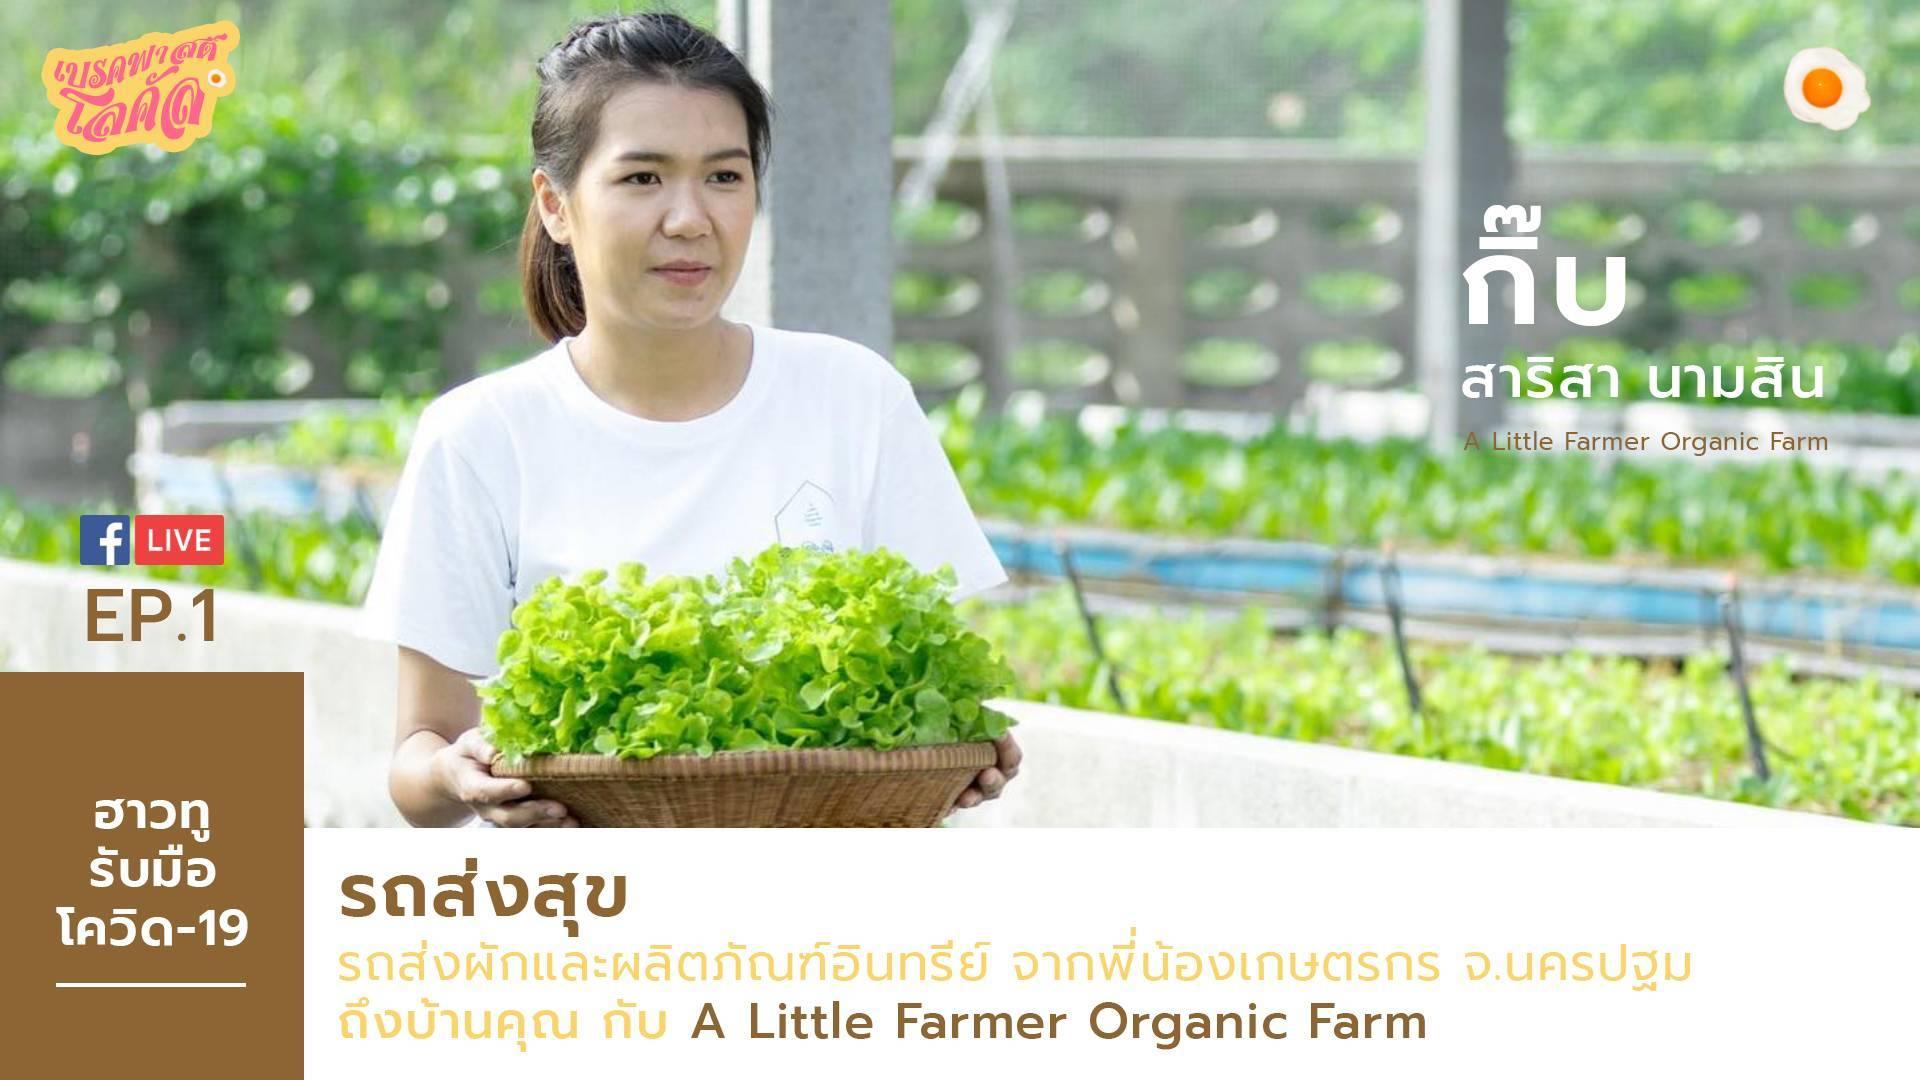 LIVE   #ฮาวทูรับมือโควิด19 #EP1 รถส่งผักและผลิตภัณฑ์อินทรีย์ จากพี่น้องเกษตรกร จ.นครปฐม ถึงบ้านคุณ กับ A Little Farmer Organic Farm